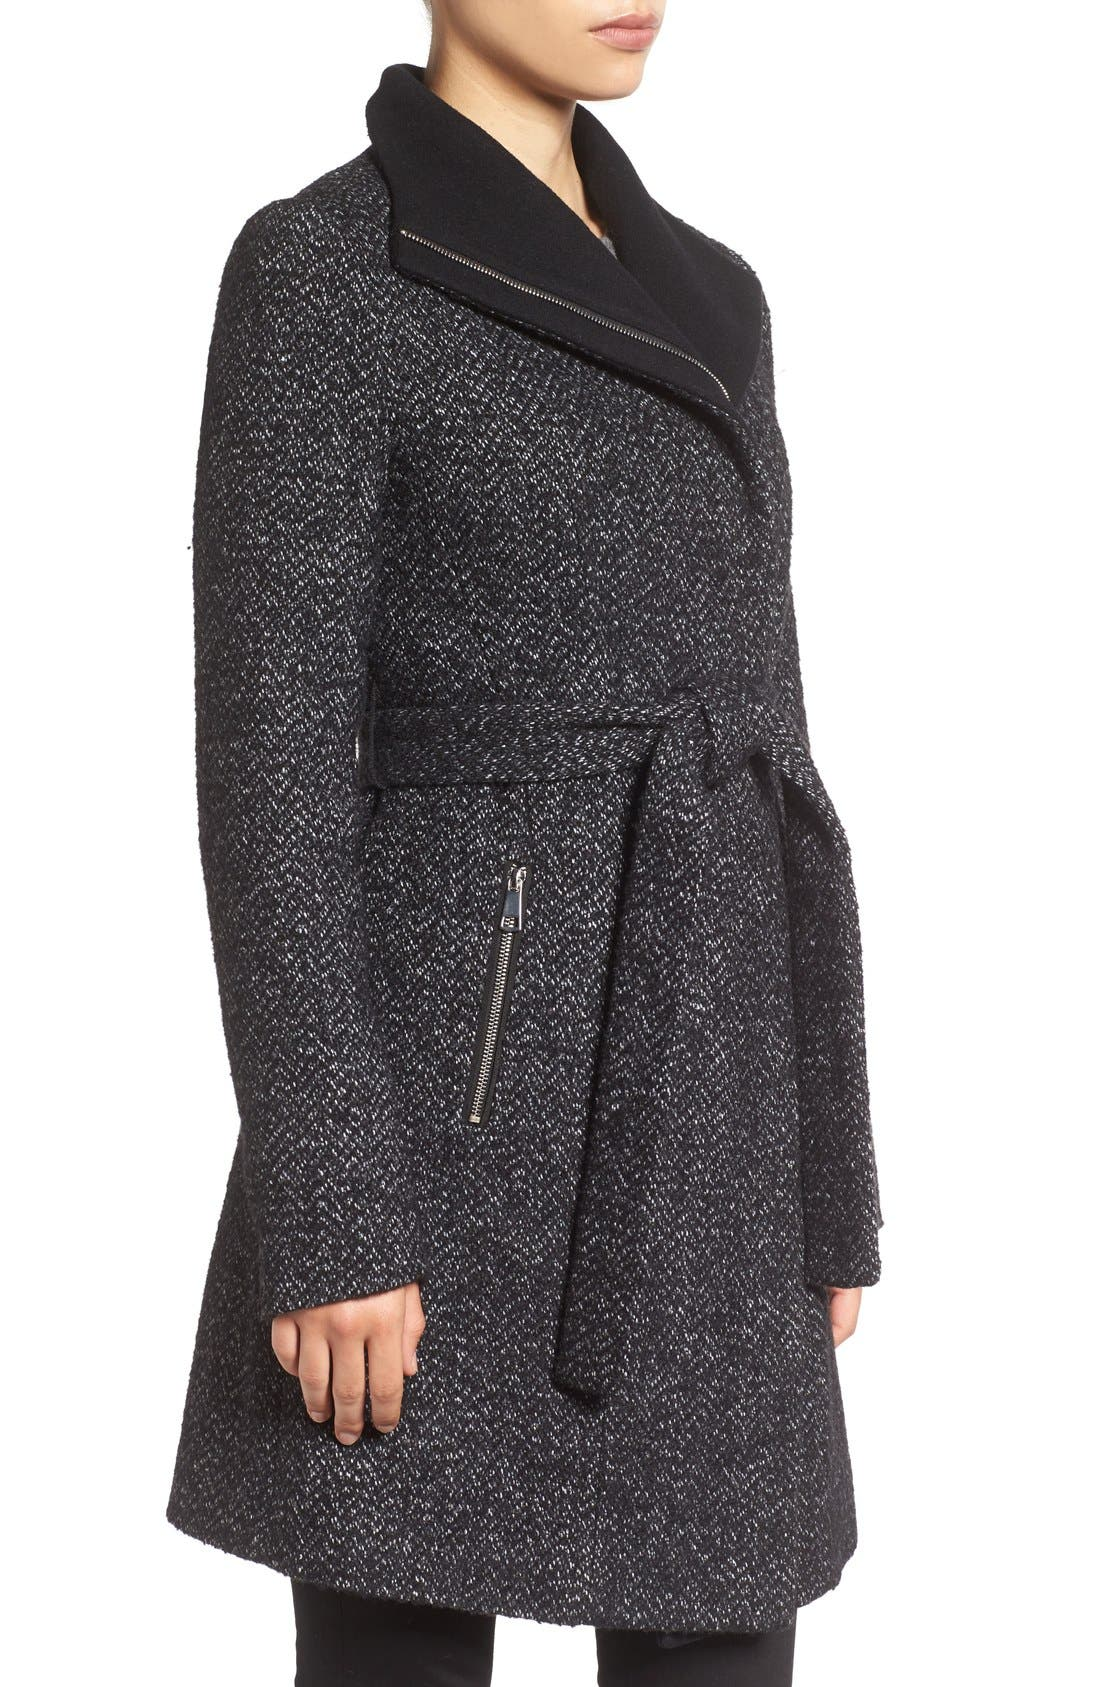 'Eva' Belted Tweed Jacket,                             Alternate thumbnail 3, color,                             008